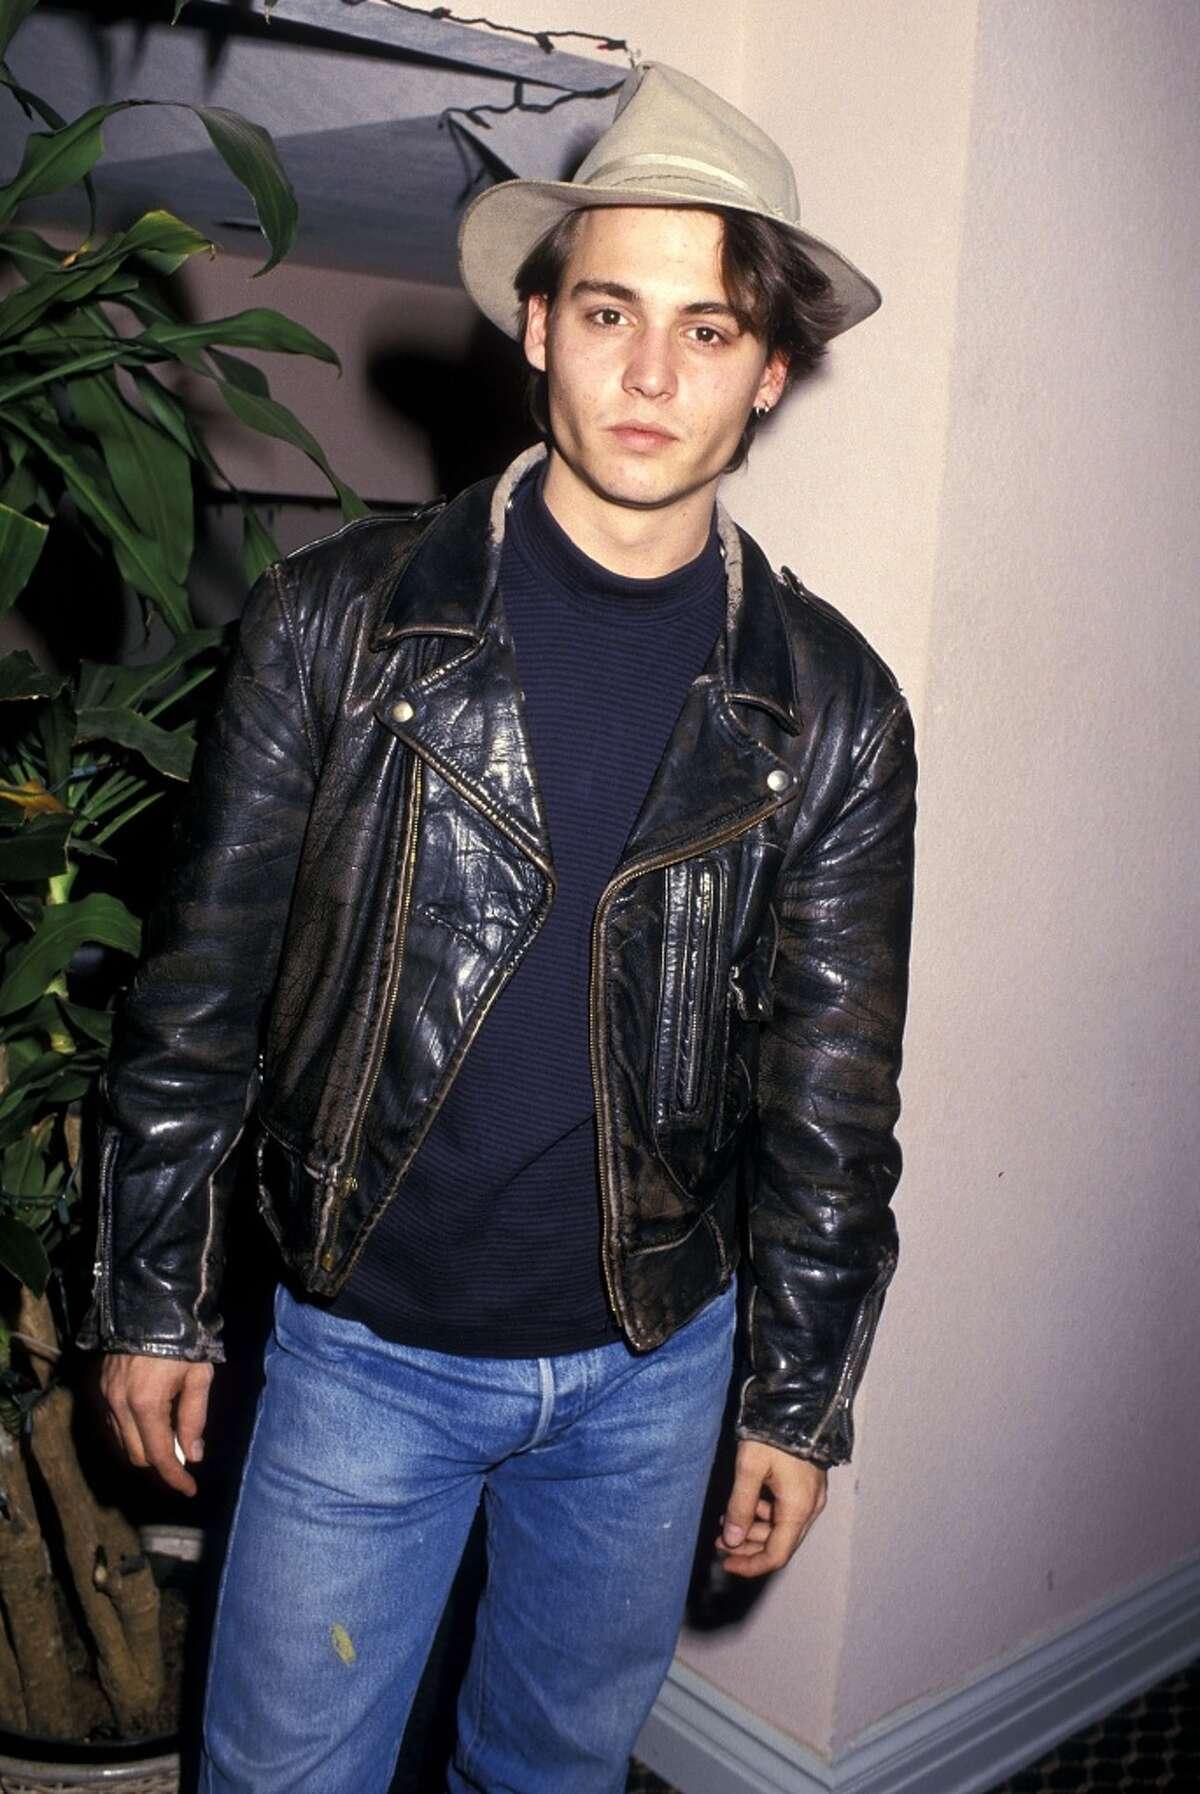 Johnny Depp was a major heartthrob, thanks to